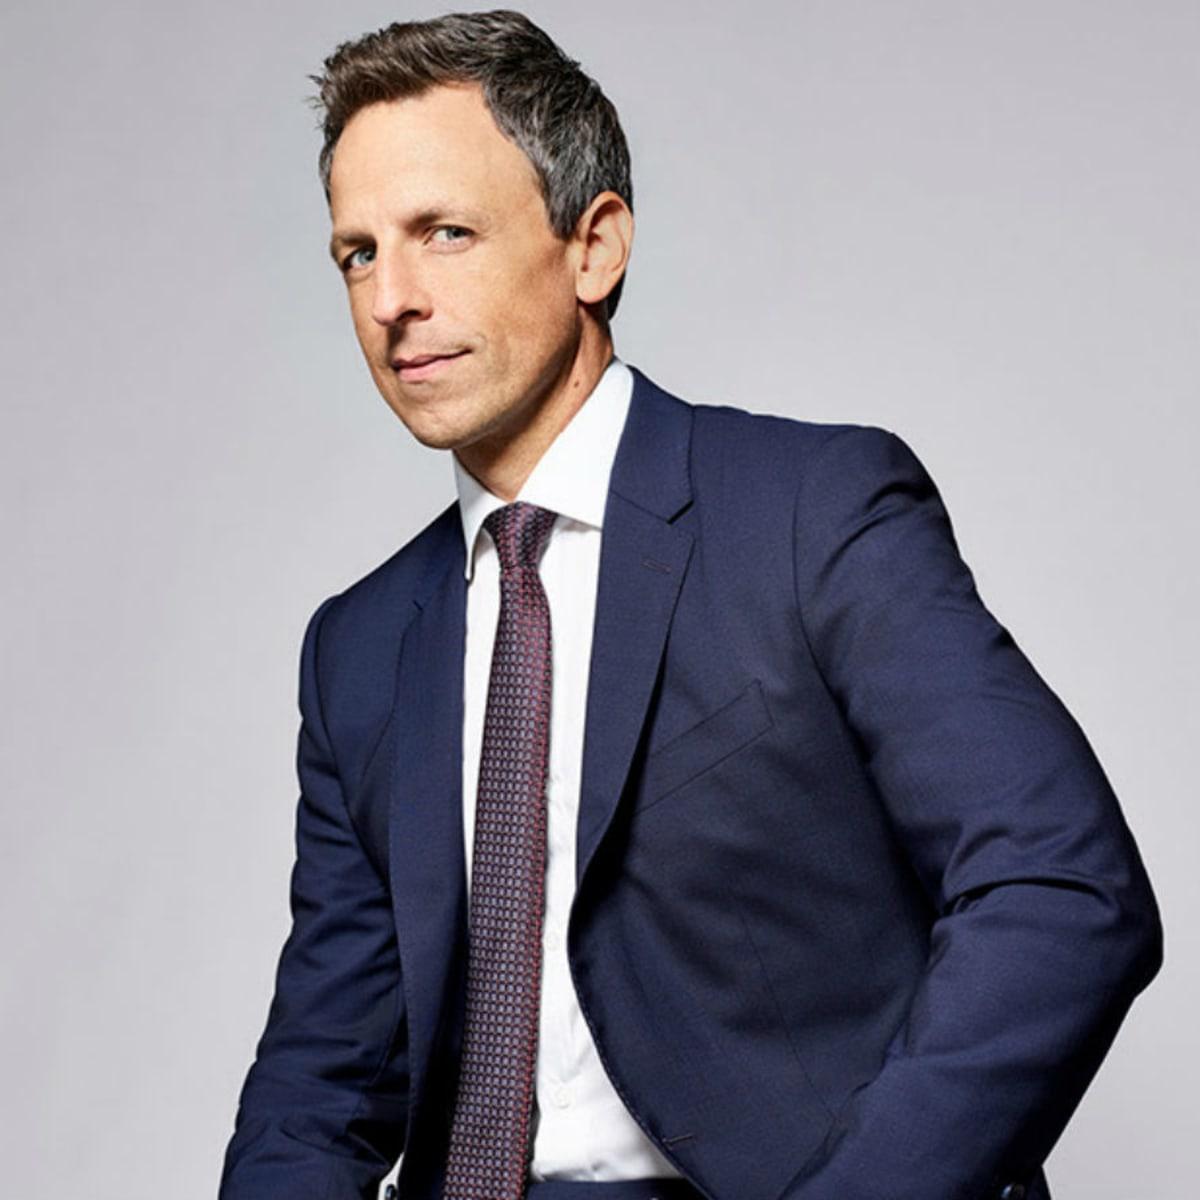 late night tv host Seth Meyers